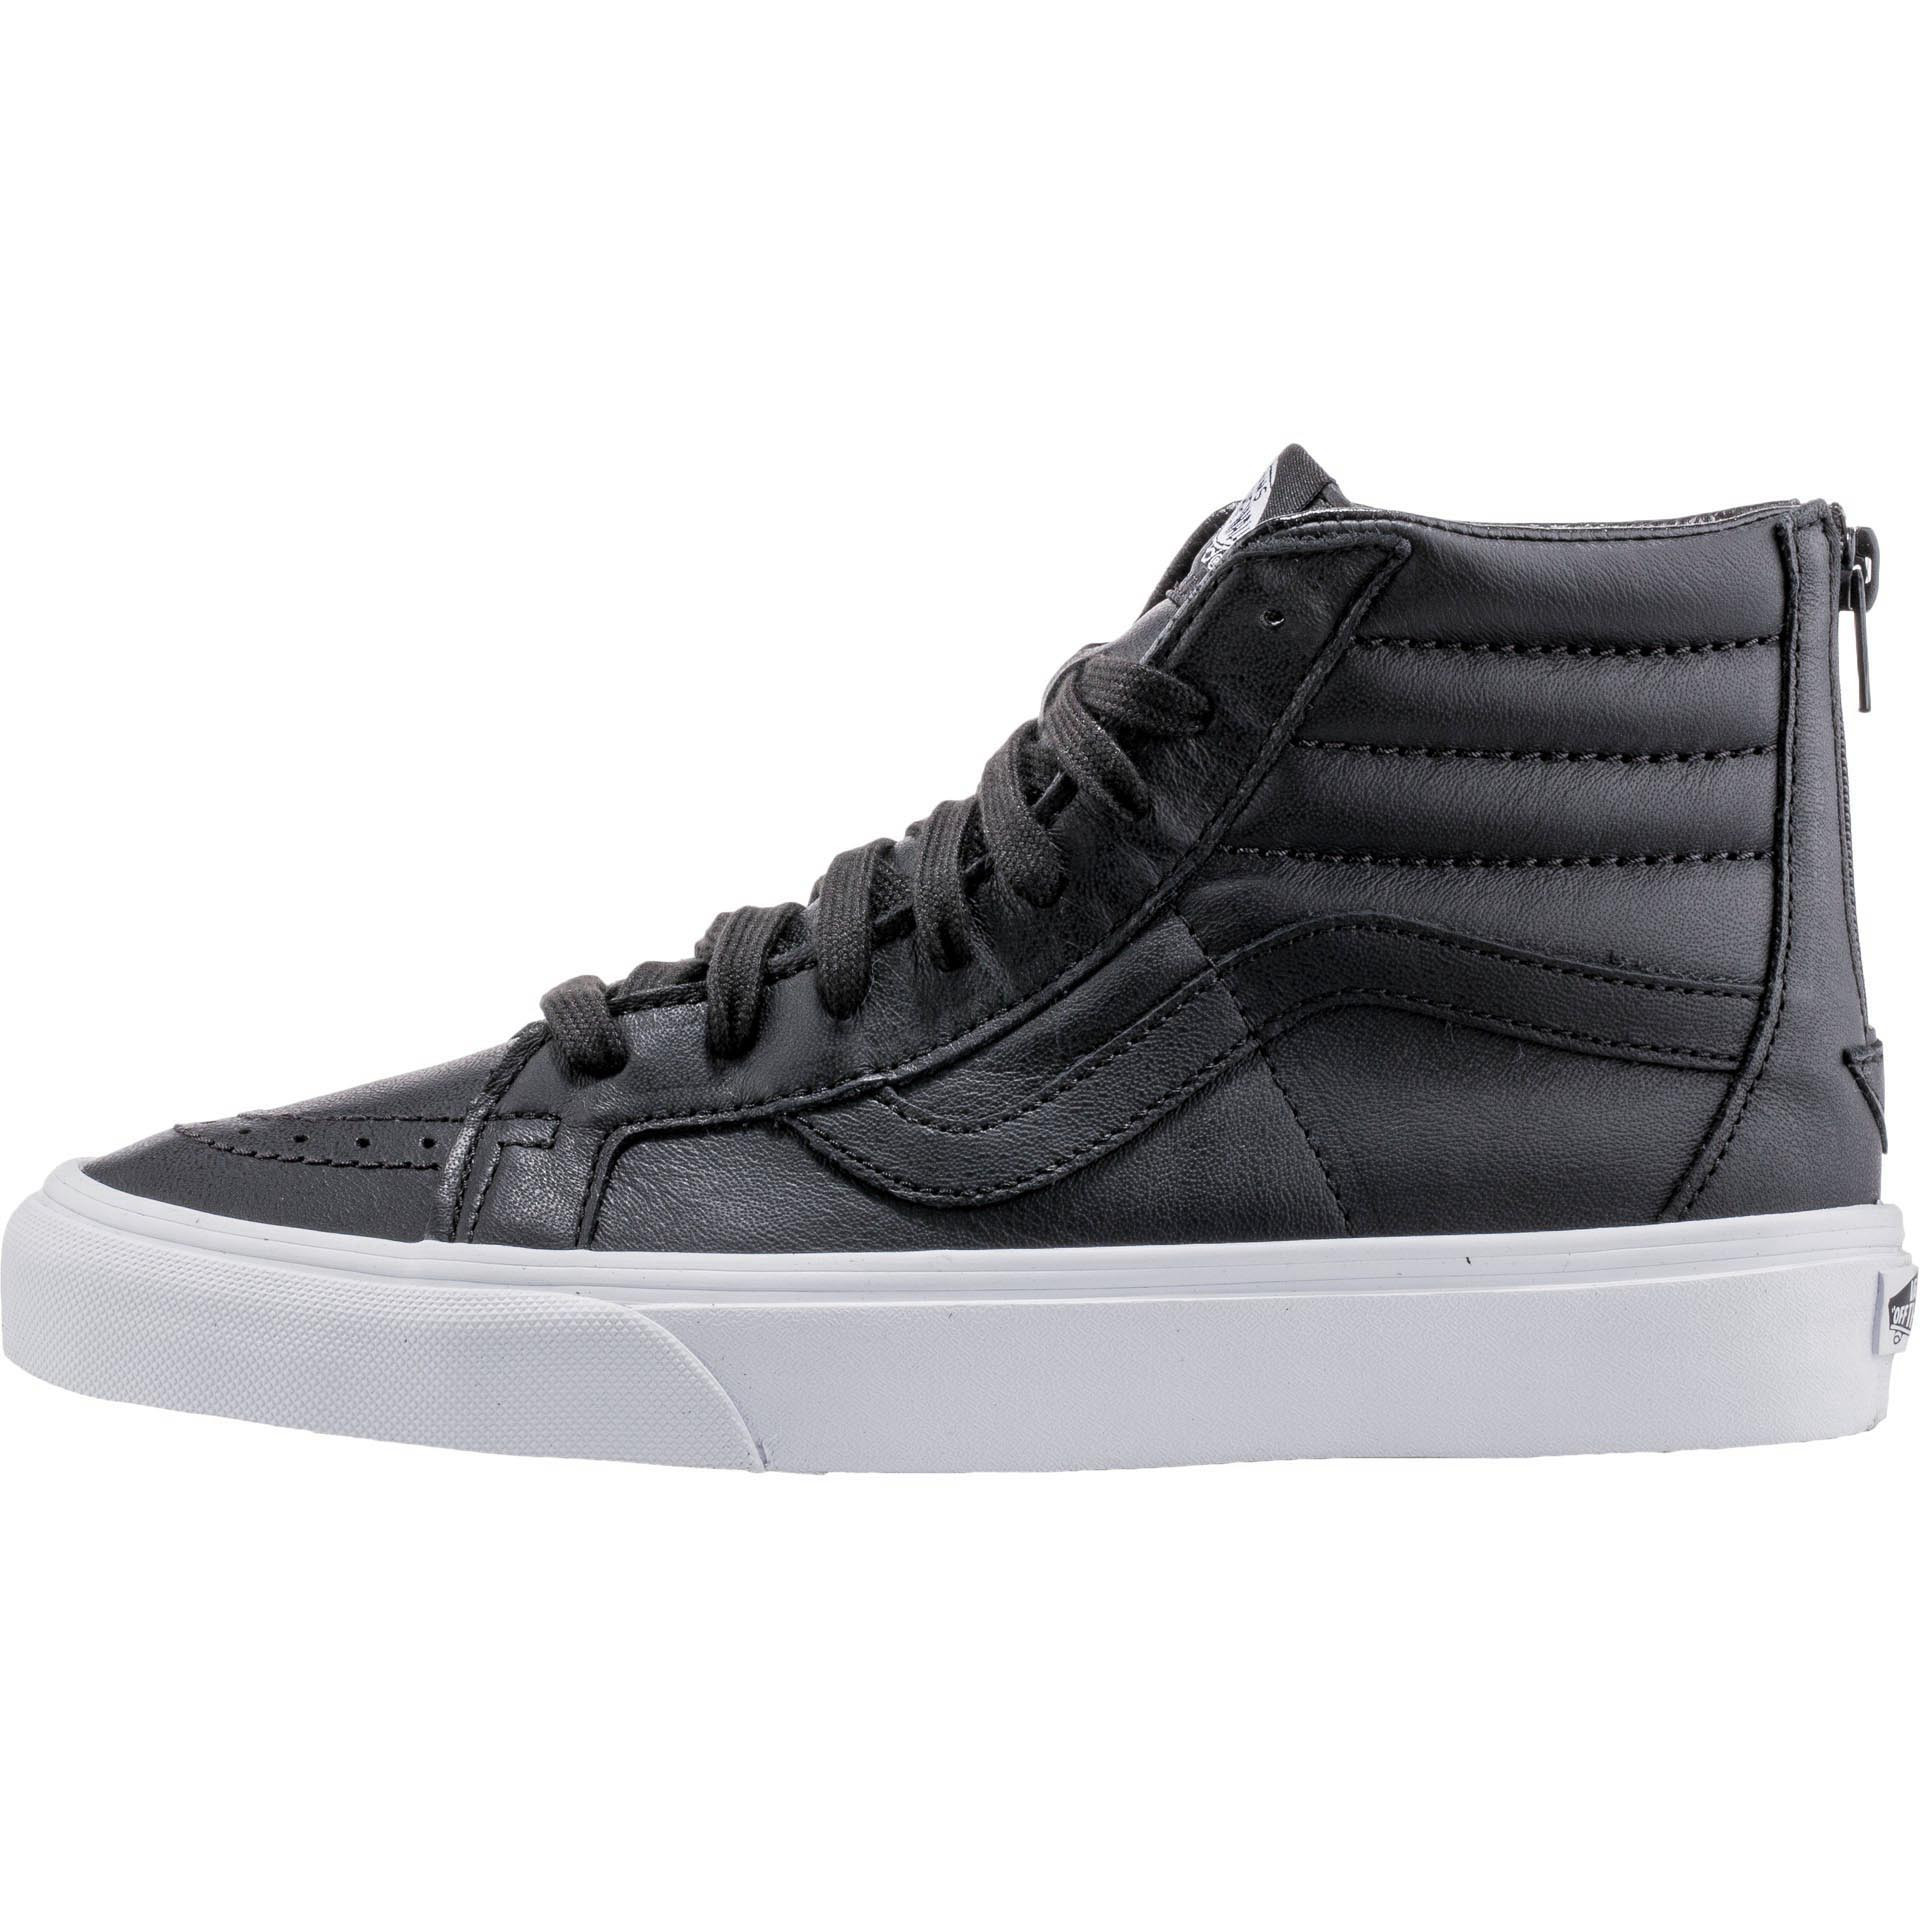 Vans - Vans SK8 Hi Reissue Zip Premium Leather Black Men s Skate Shoes Size  10 - Walmart.com 62675ca2c4fc